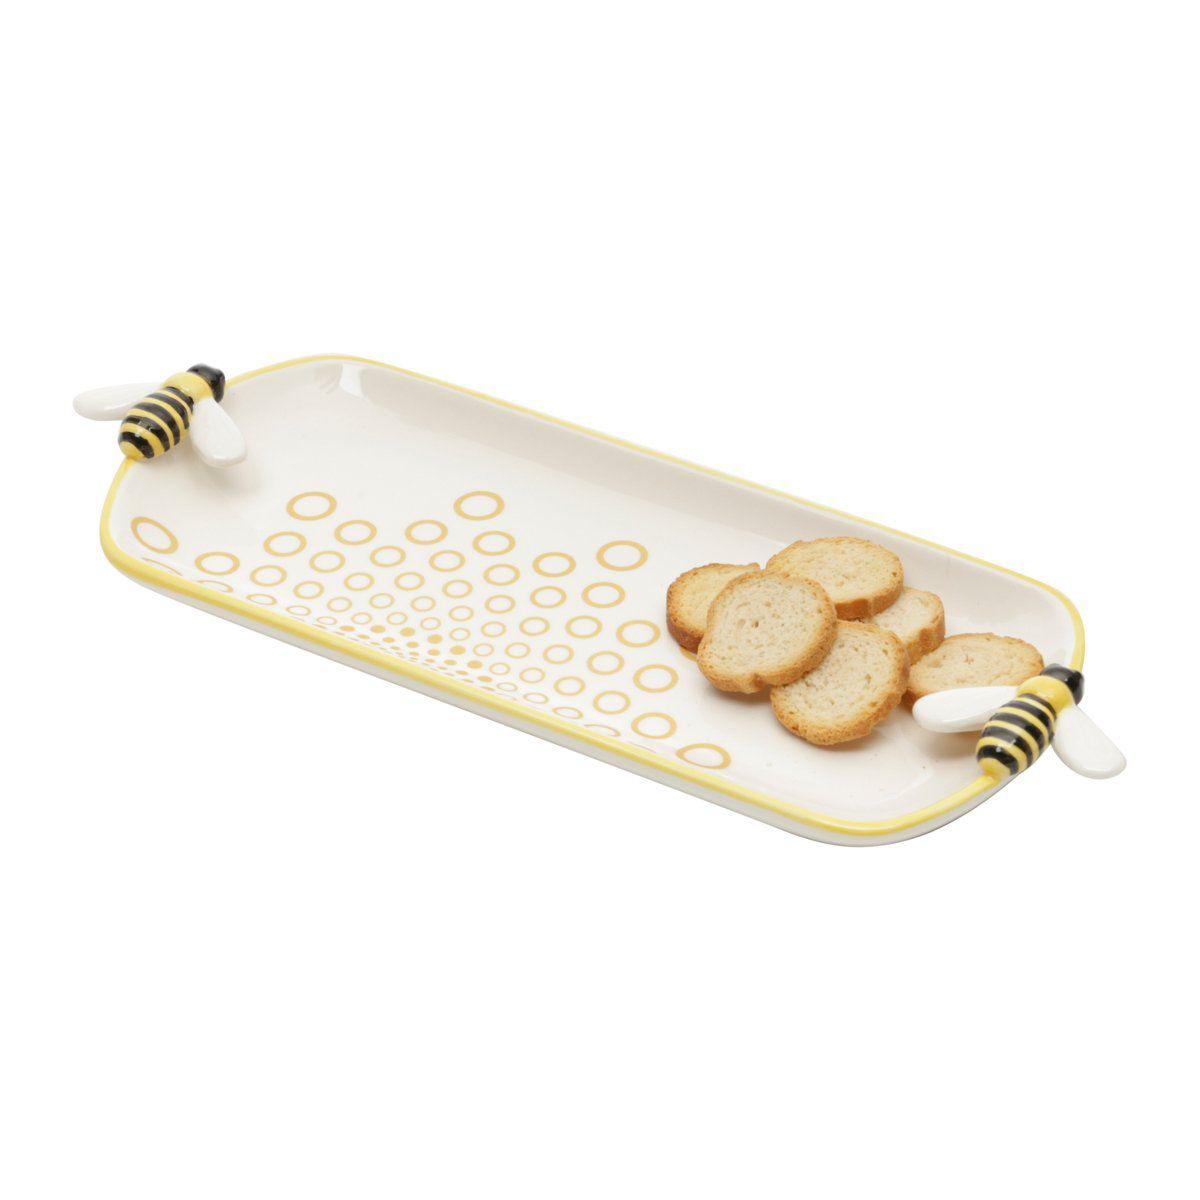 Travessa 21,5 x 8,5 cm de cerâmica branca e amarela Abelha Lyor - L64026